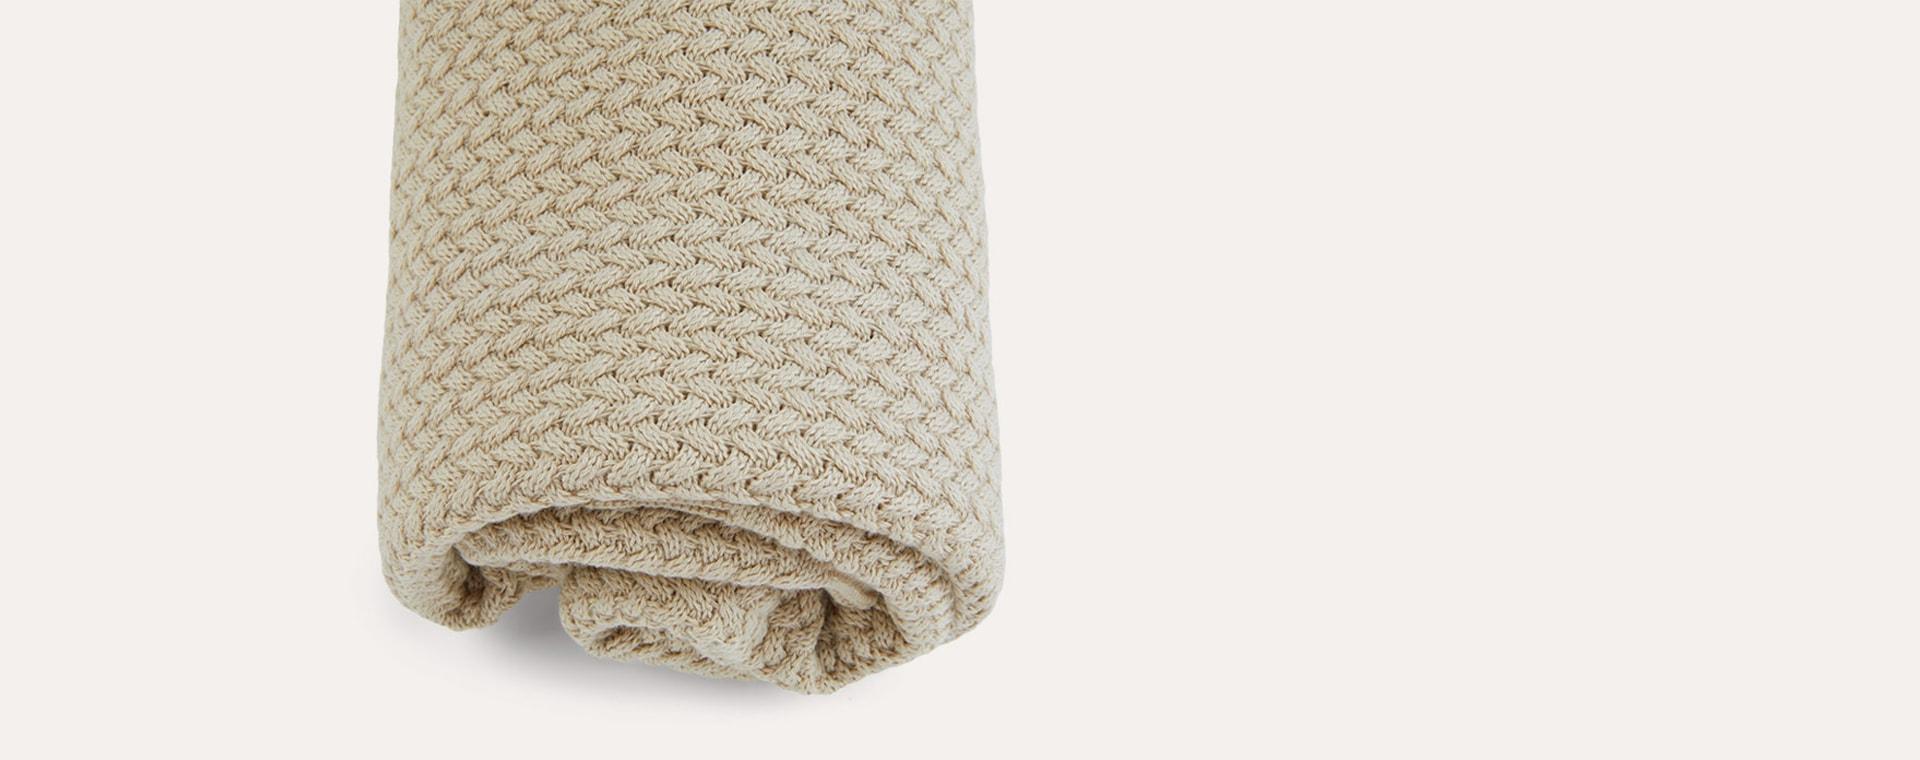 Oat Avery Row Knitted Blanket